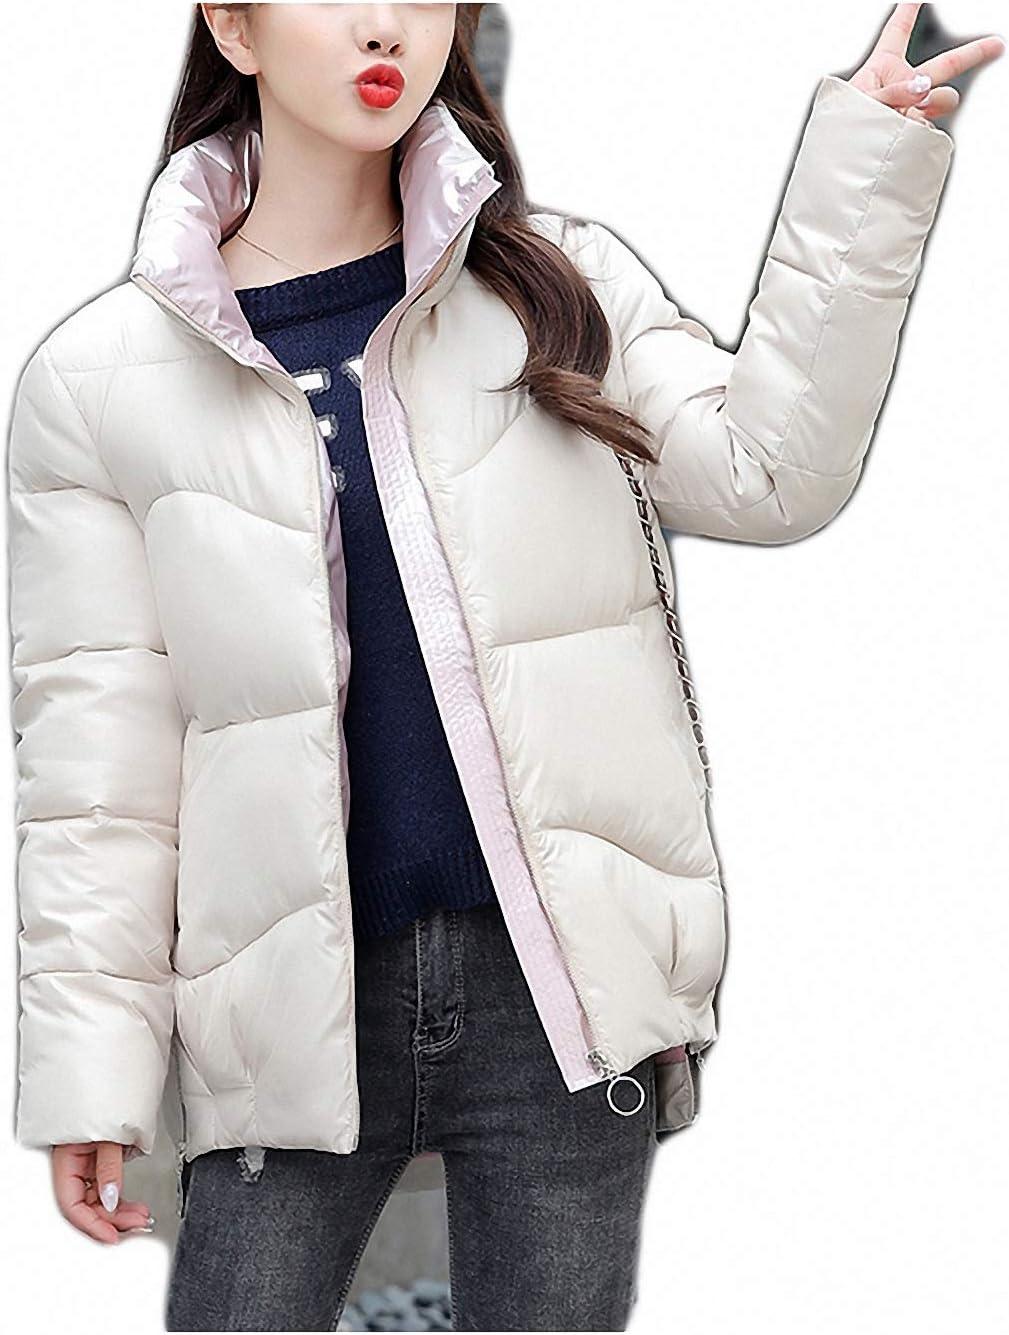 Winter Jacket Stand-Callor Coat Women Jackets Winter Warm Woman Clothing Casual Parkas White XXXL